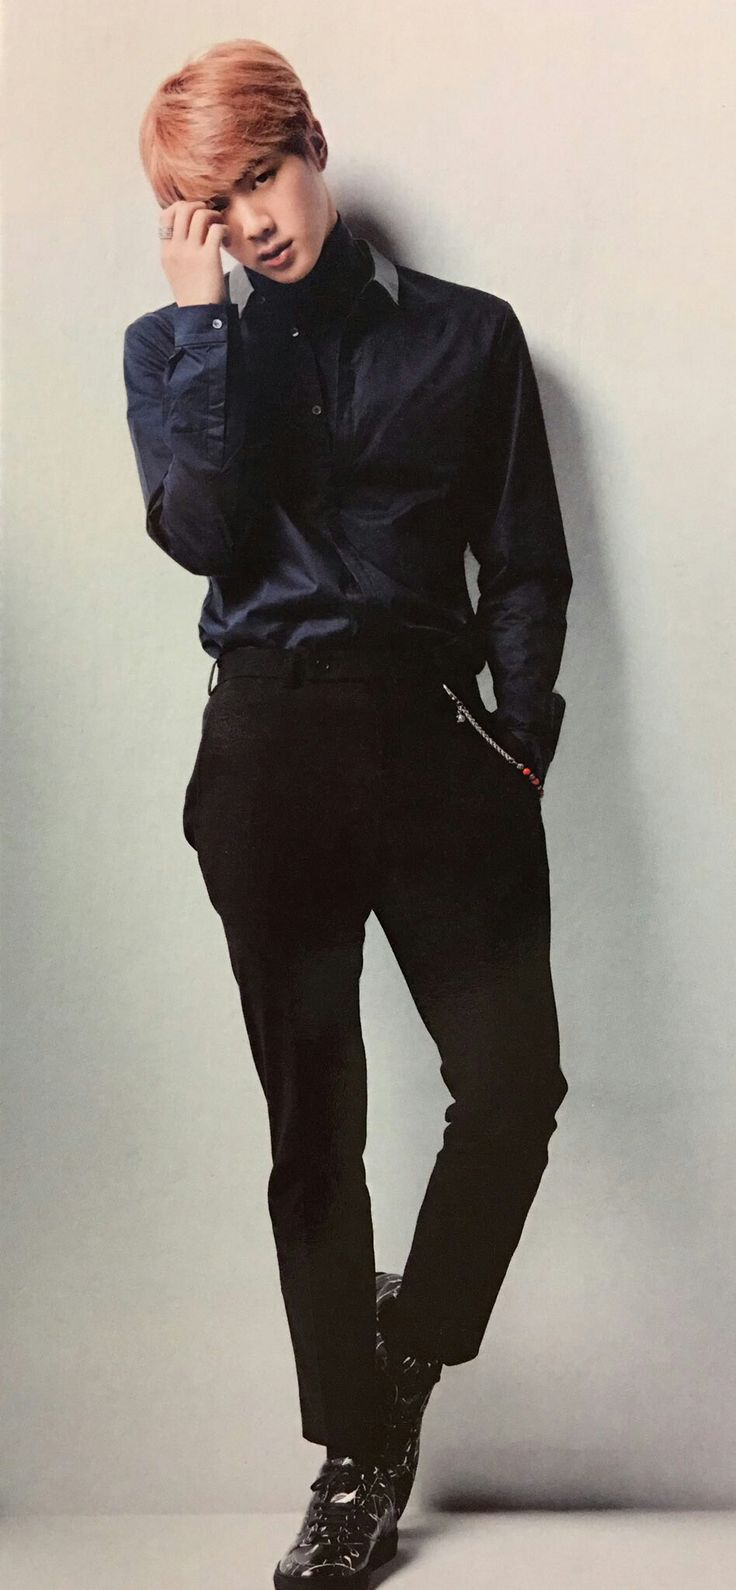 Jin ❤ 'Best of BTS' Album Photos #BTS #방탄소년단